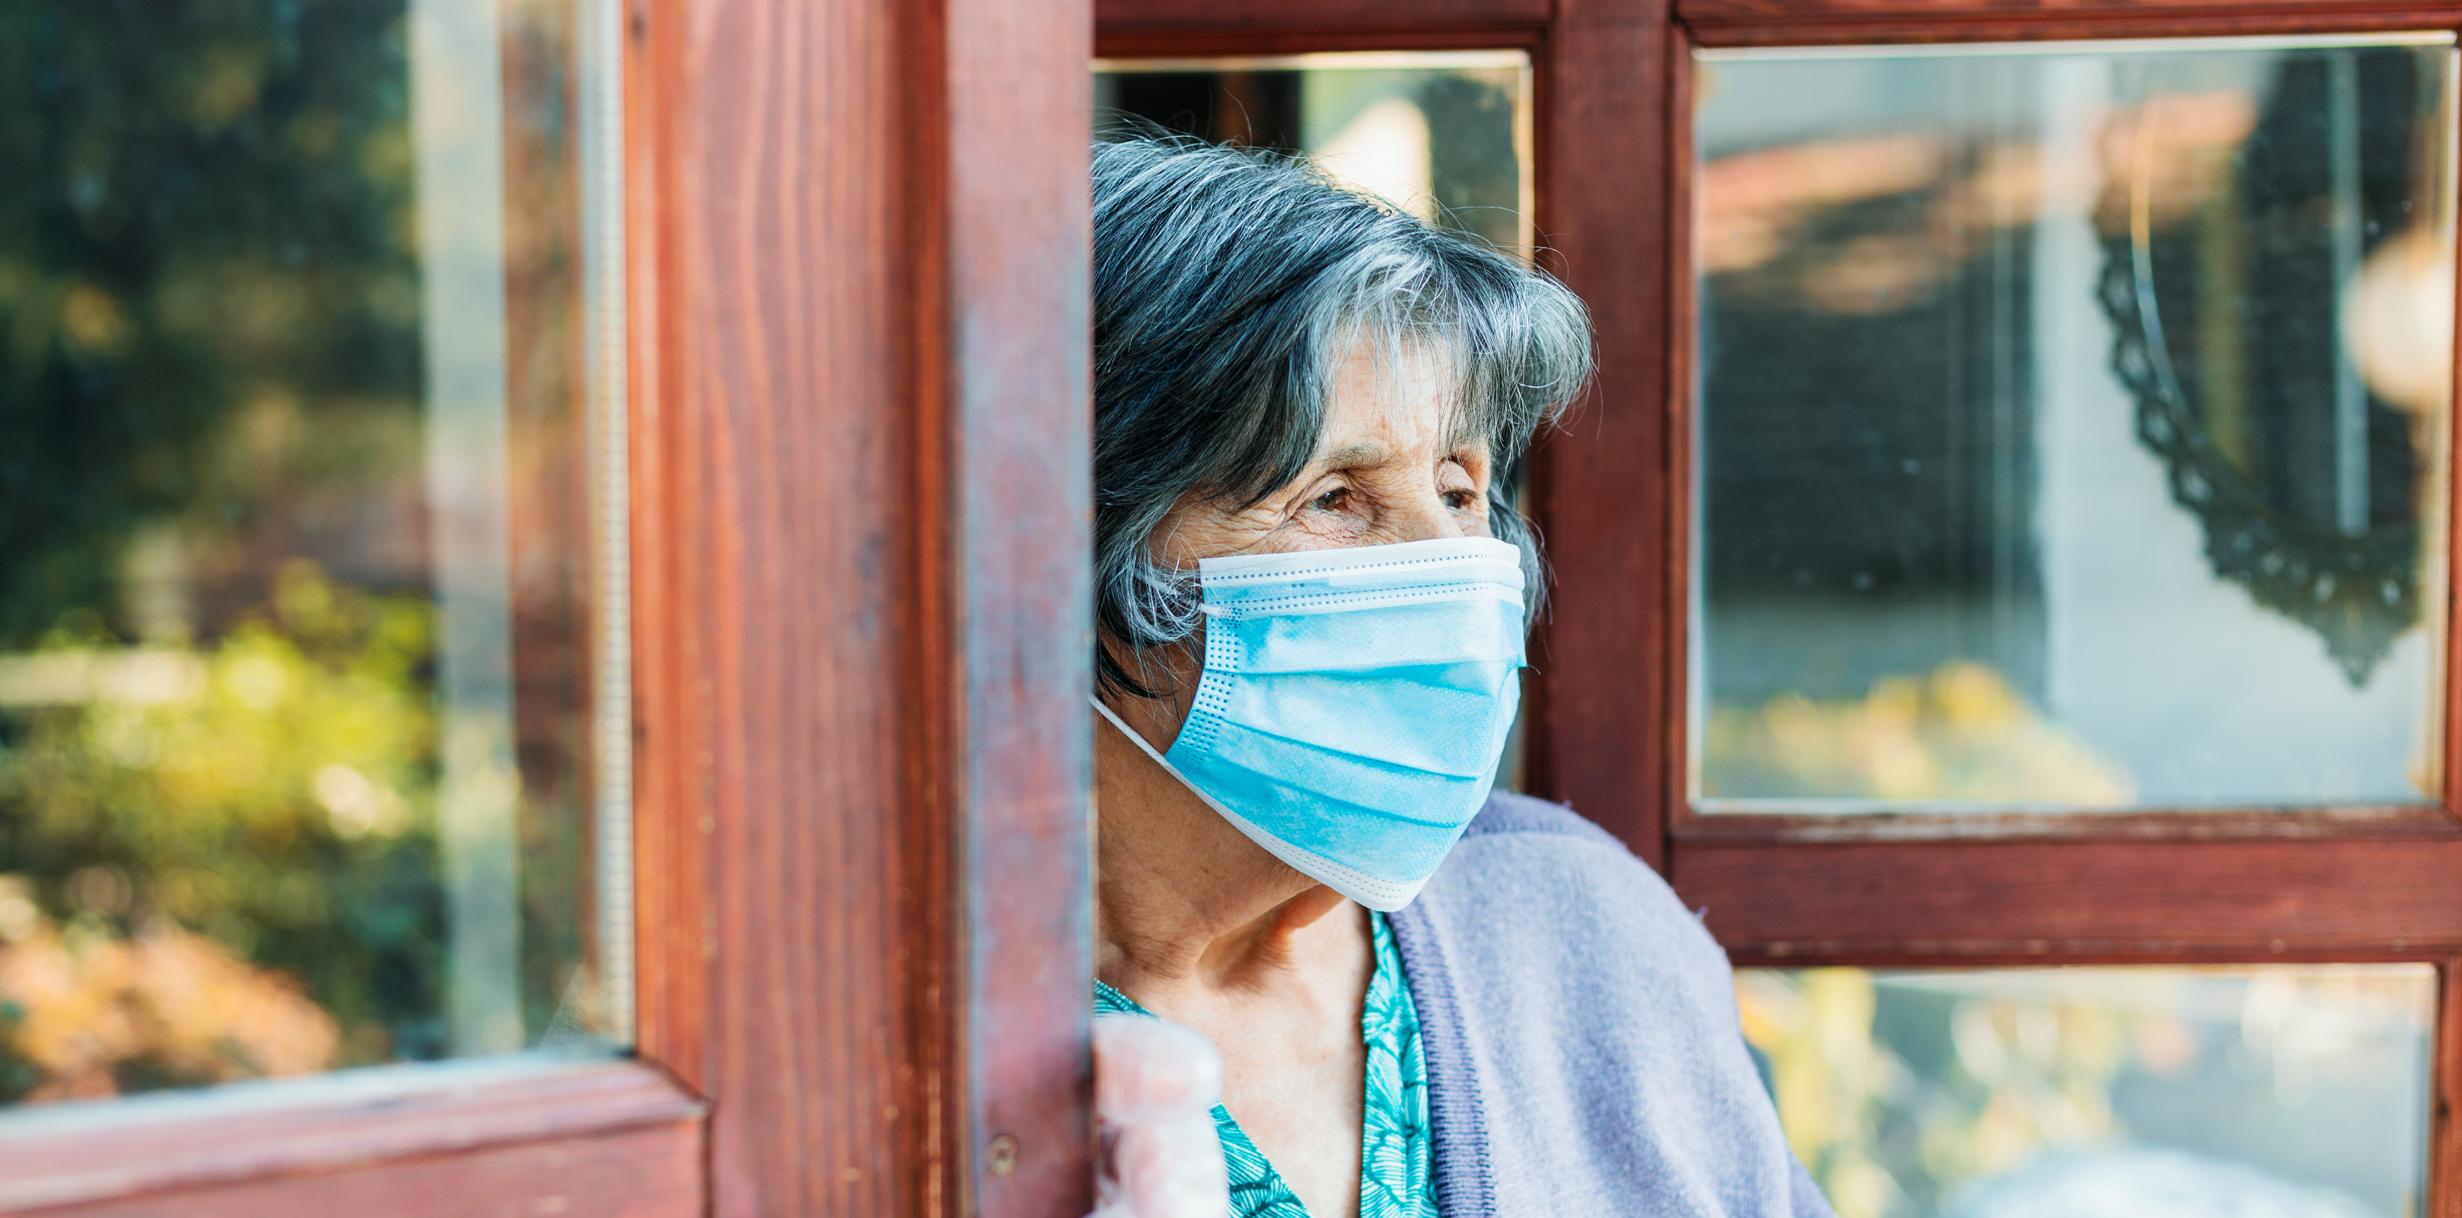 Elderly Woman in Mask Against Covid-19